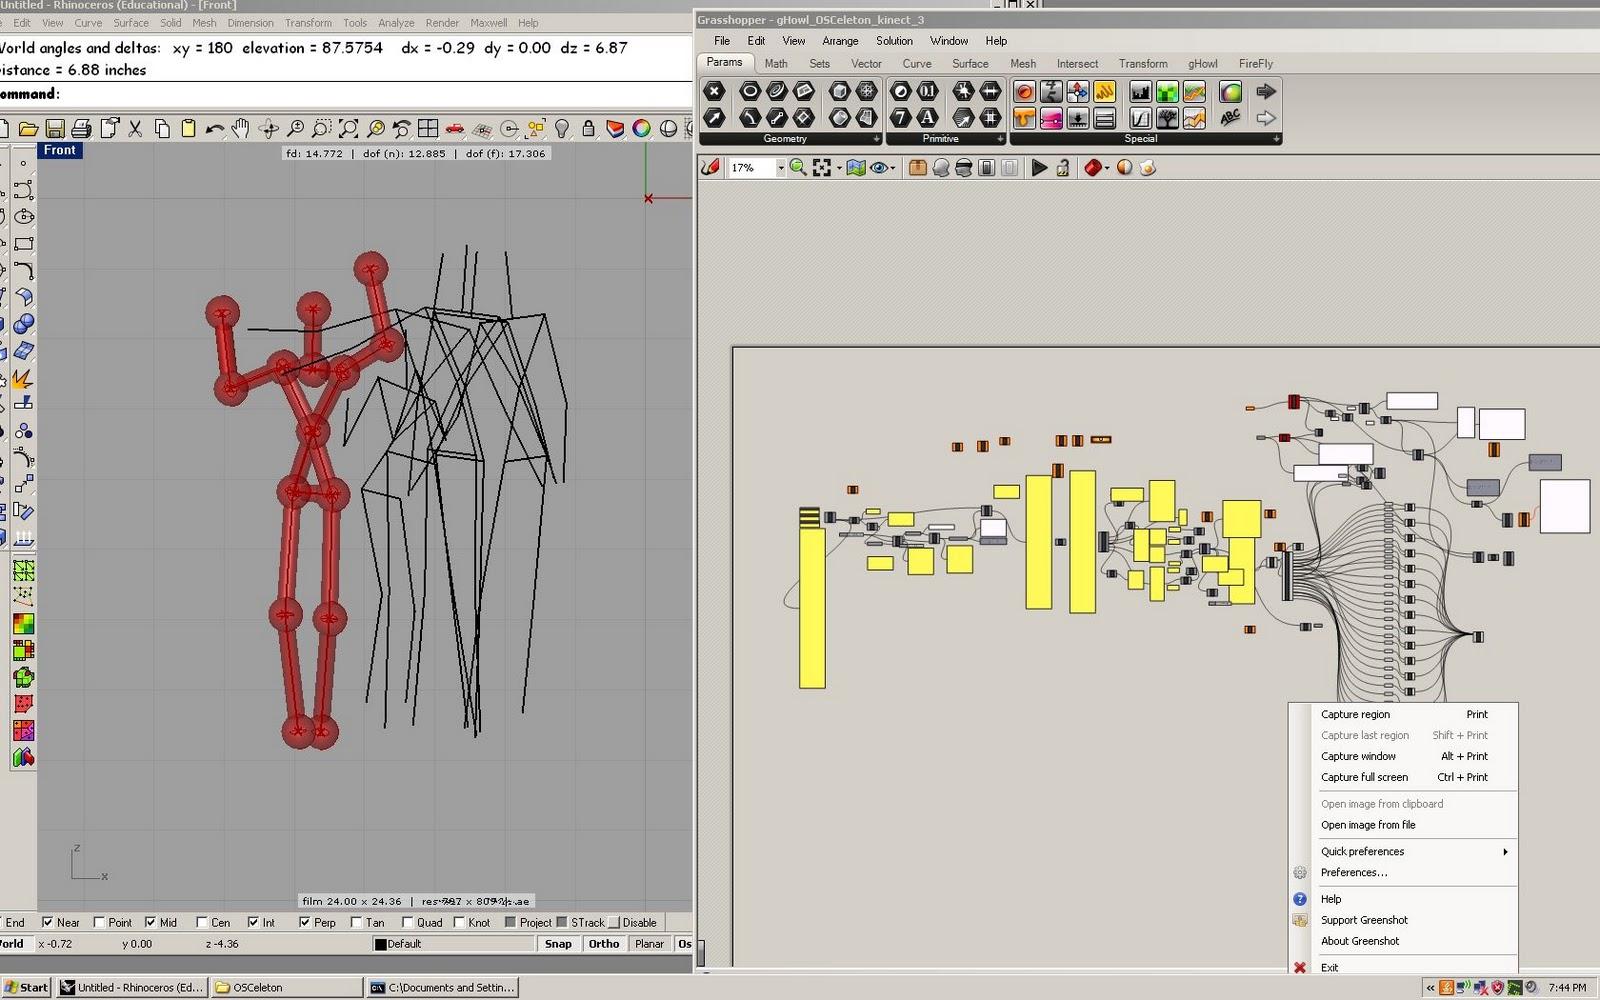 GH kinect: OSCeleton GHowl Kinect Grasshopper OpenNI Nite